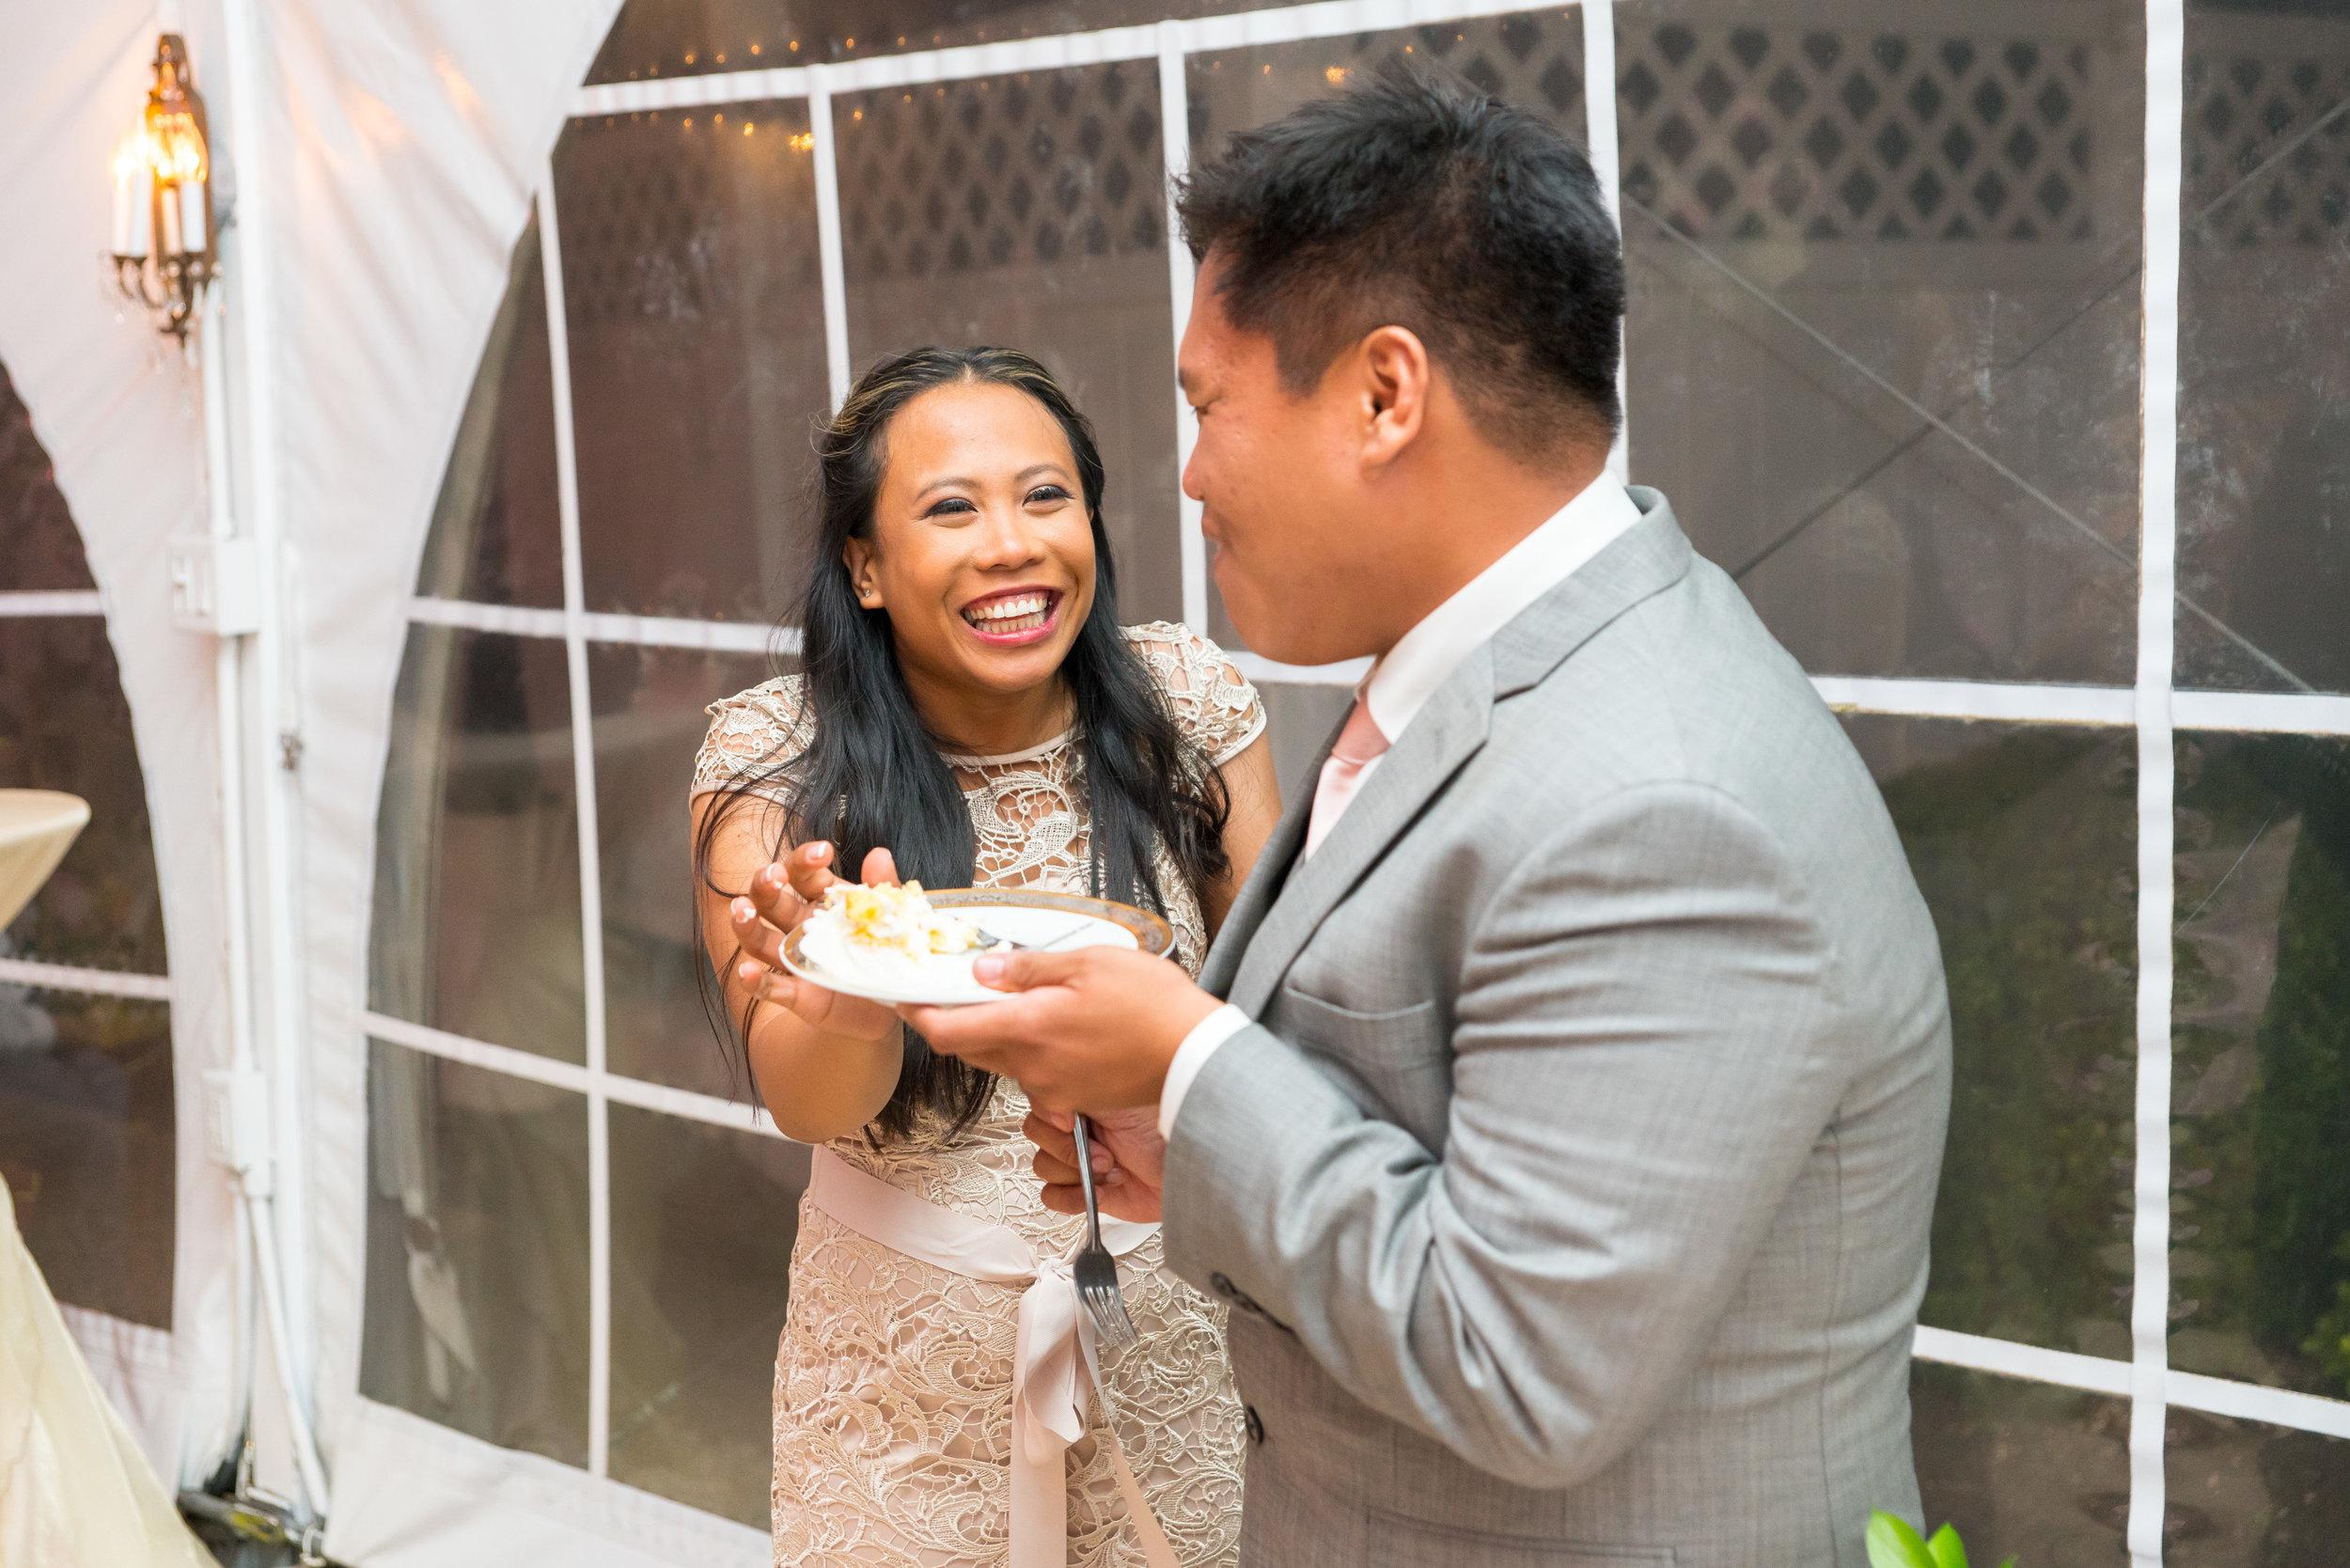 Cake cutting at maryland wedding photos